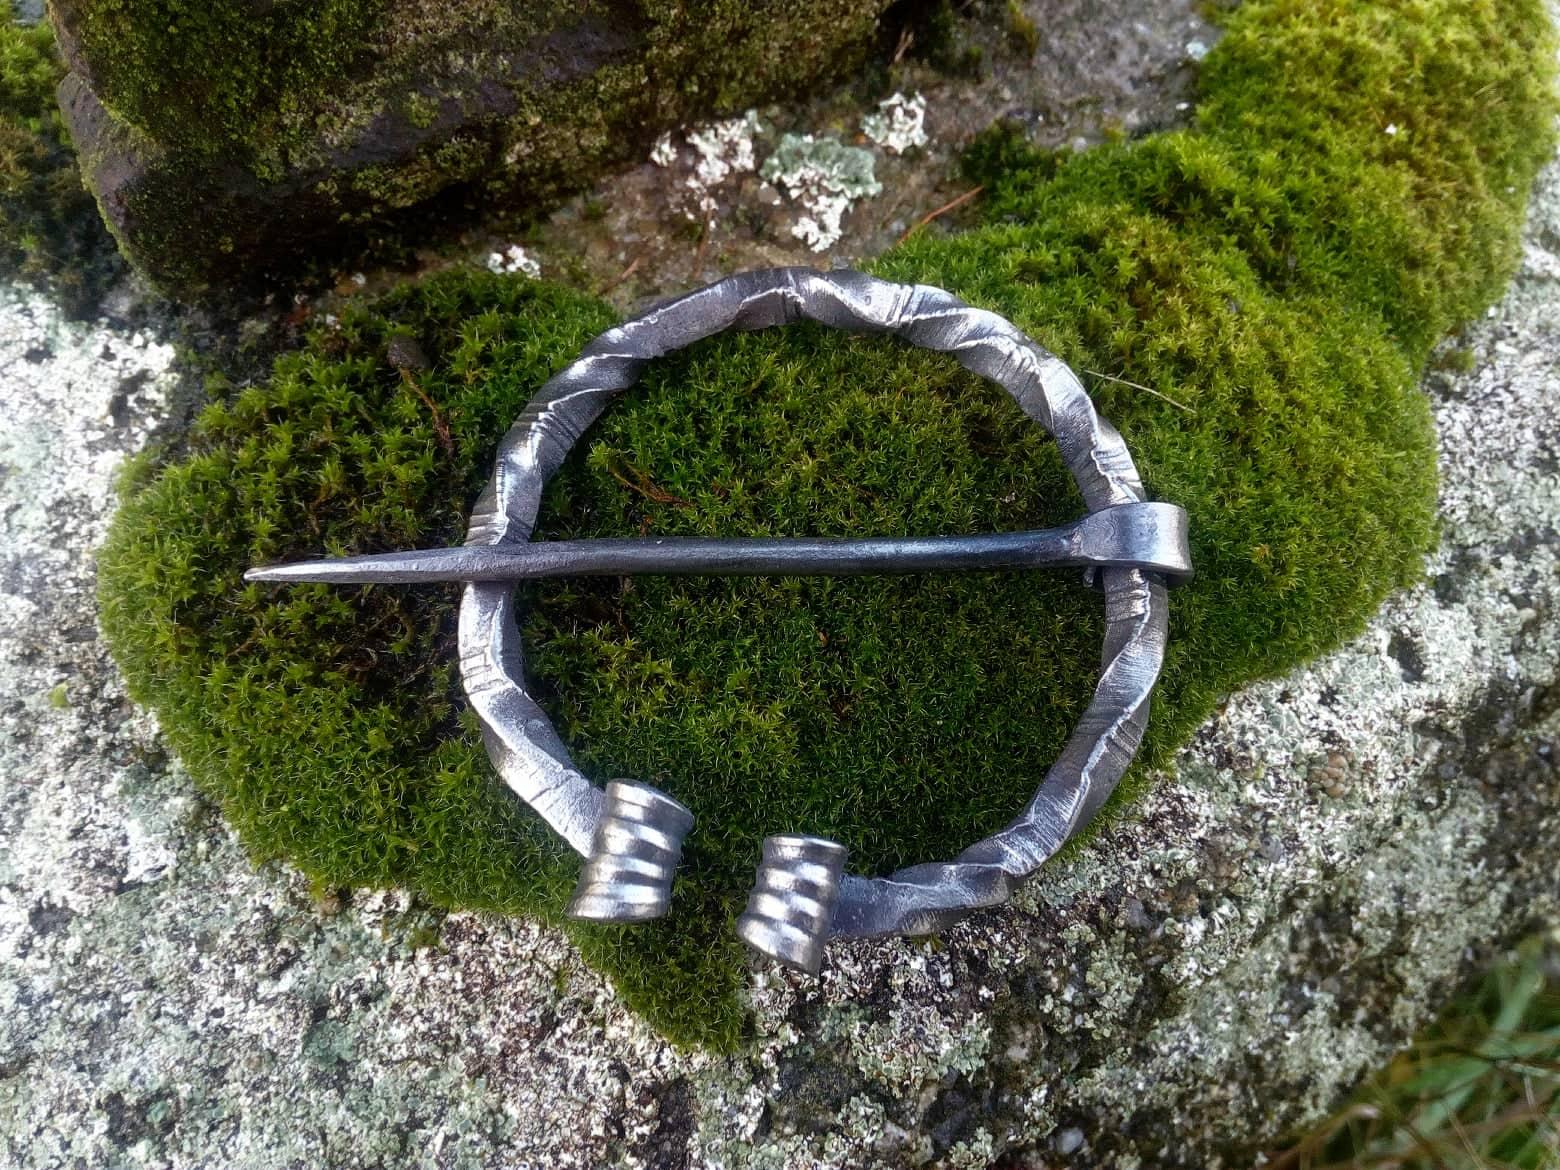 Early Medieval Cloak Pin – Steel